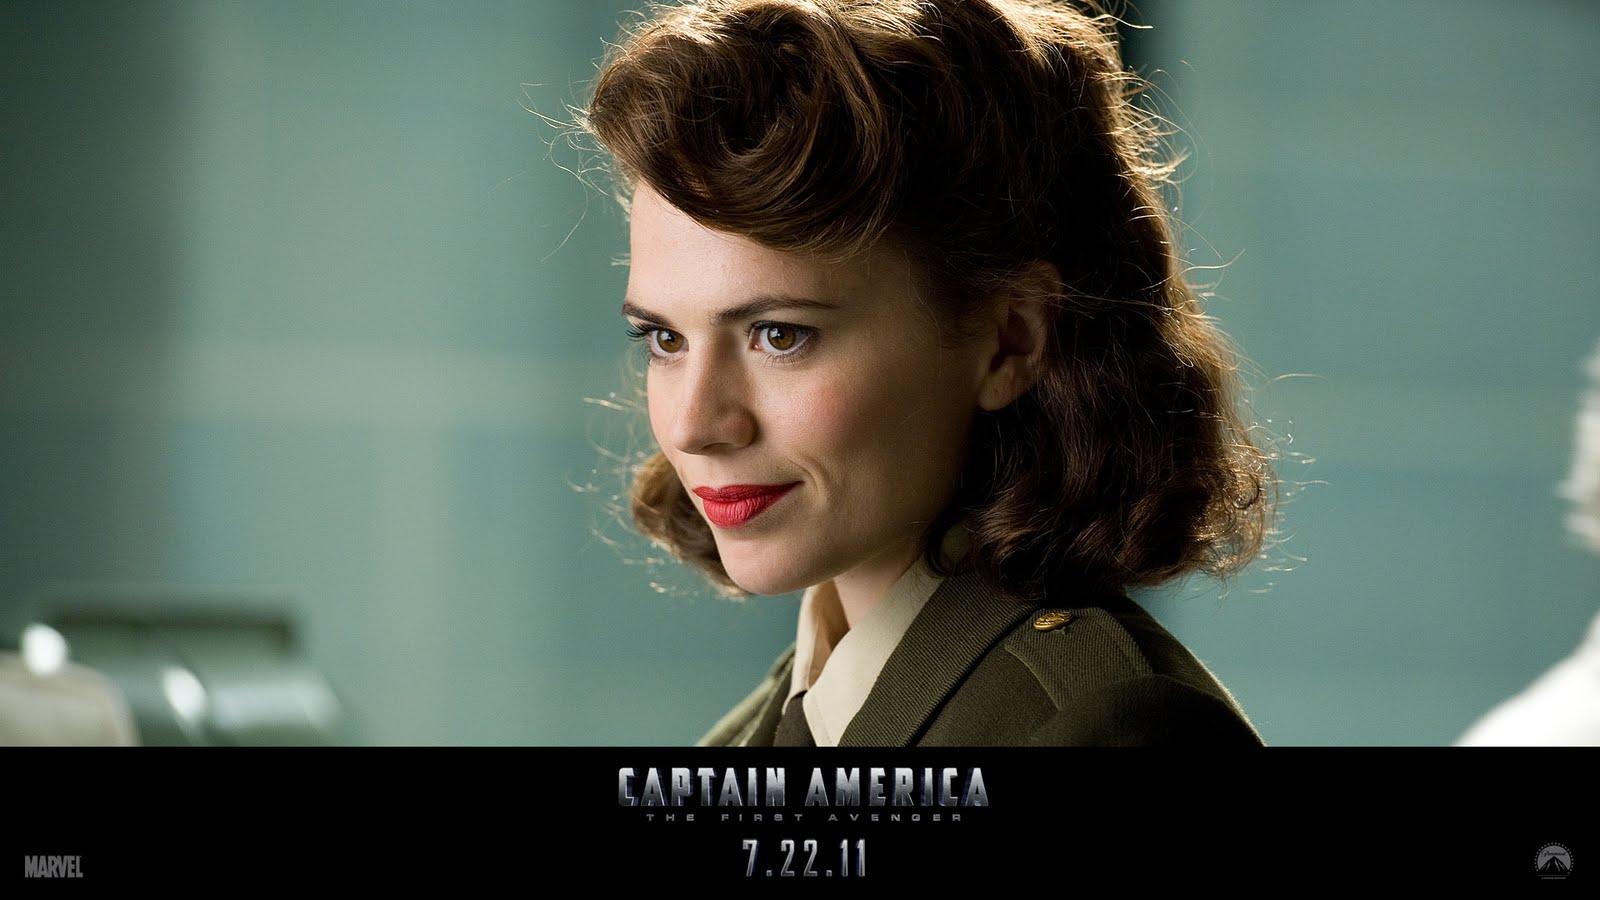 http://2.bp.blogspot.com/-x4quD64_Q5k/TjQ4oTFOWsI/AAAAAAAAB5M/od89AQMlE2M/s1600/Hayley_Atwell_in_Captain_America%2B_The_First_Avenger_Wallpaper_4_1024.jpg